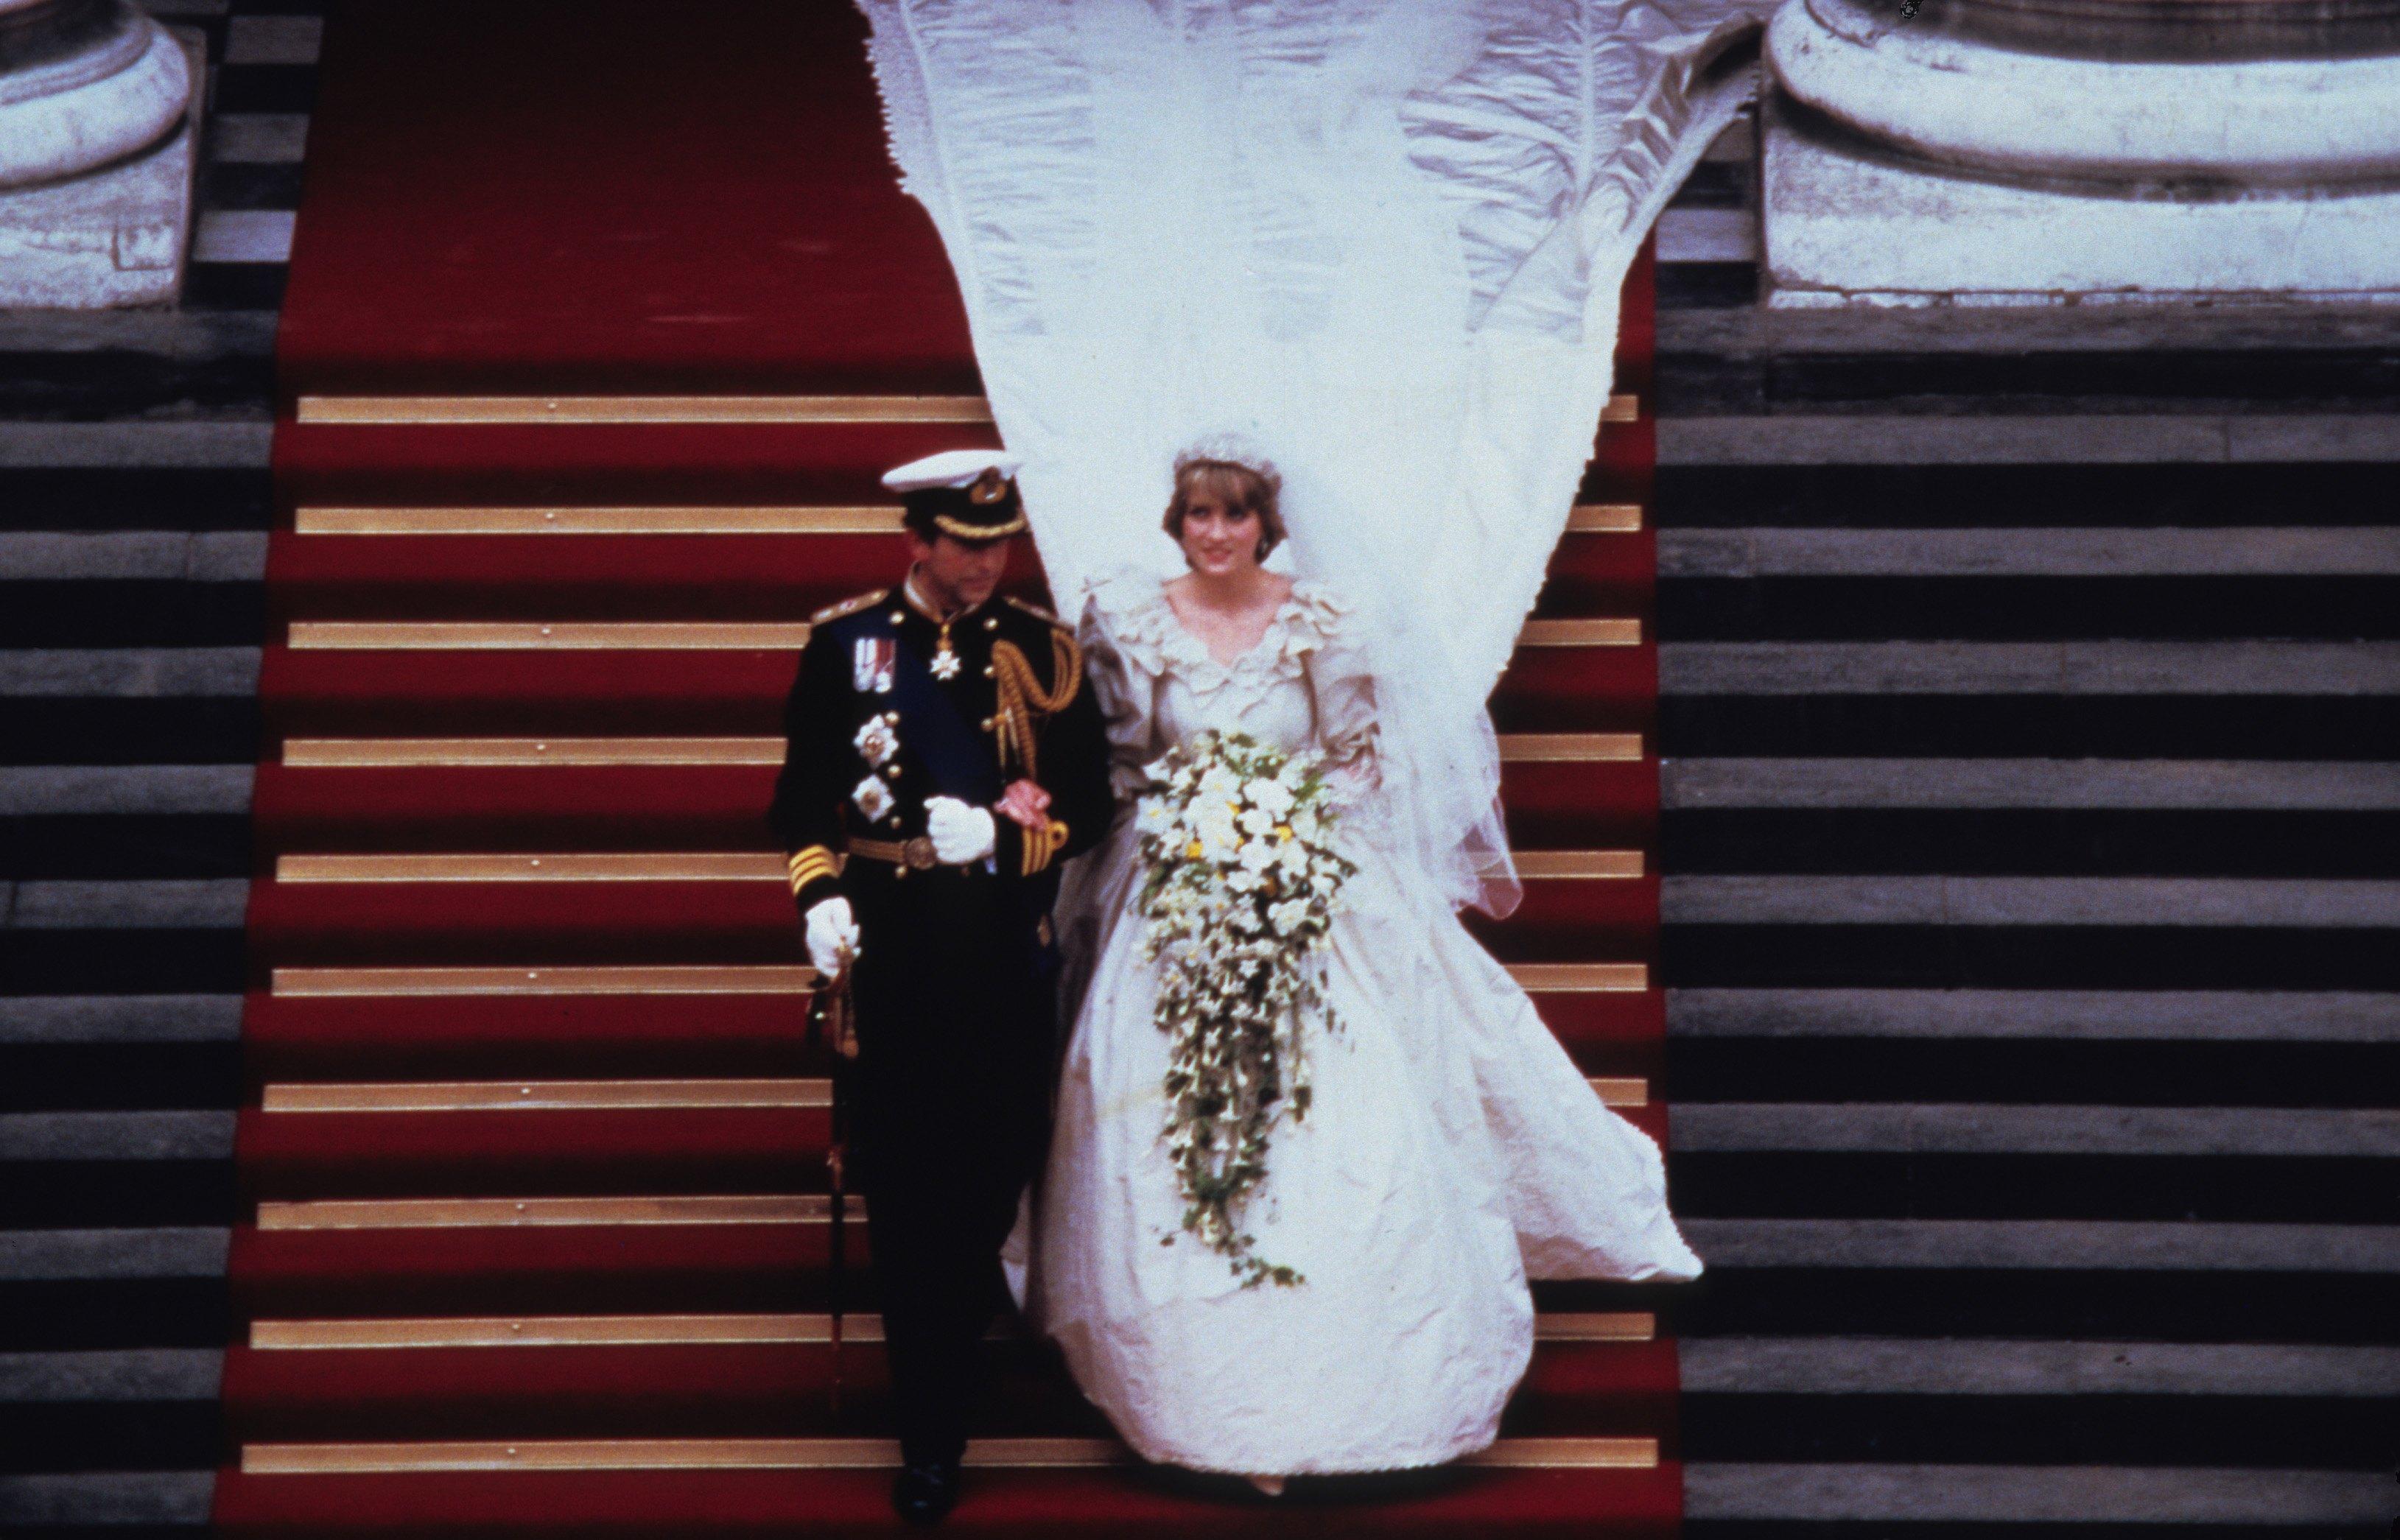 Princess Diana S Wedding Dress Designer Reveals New Gown Facts